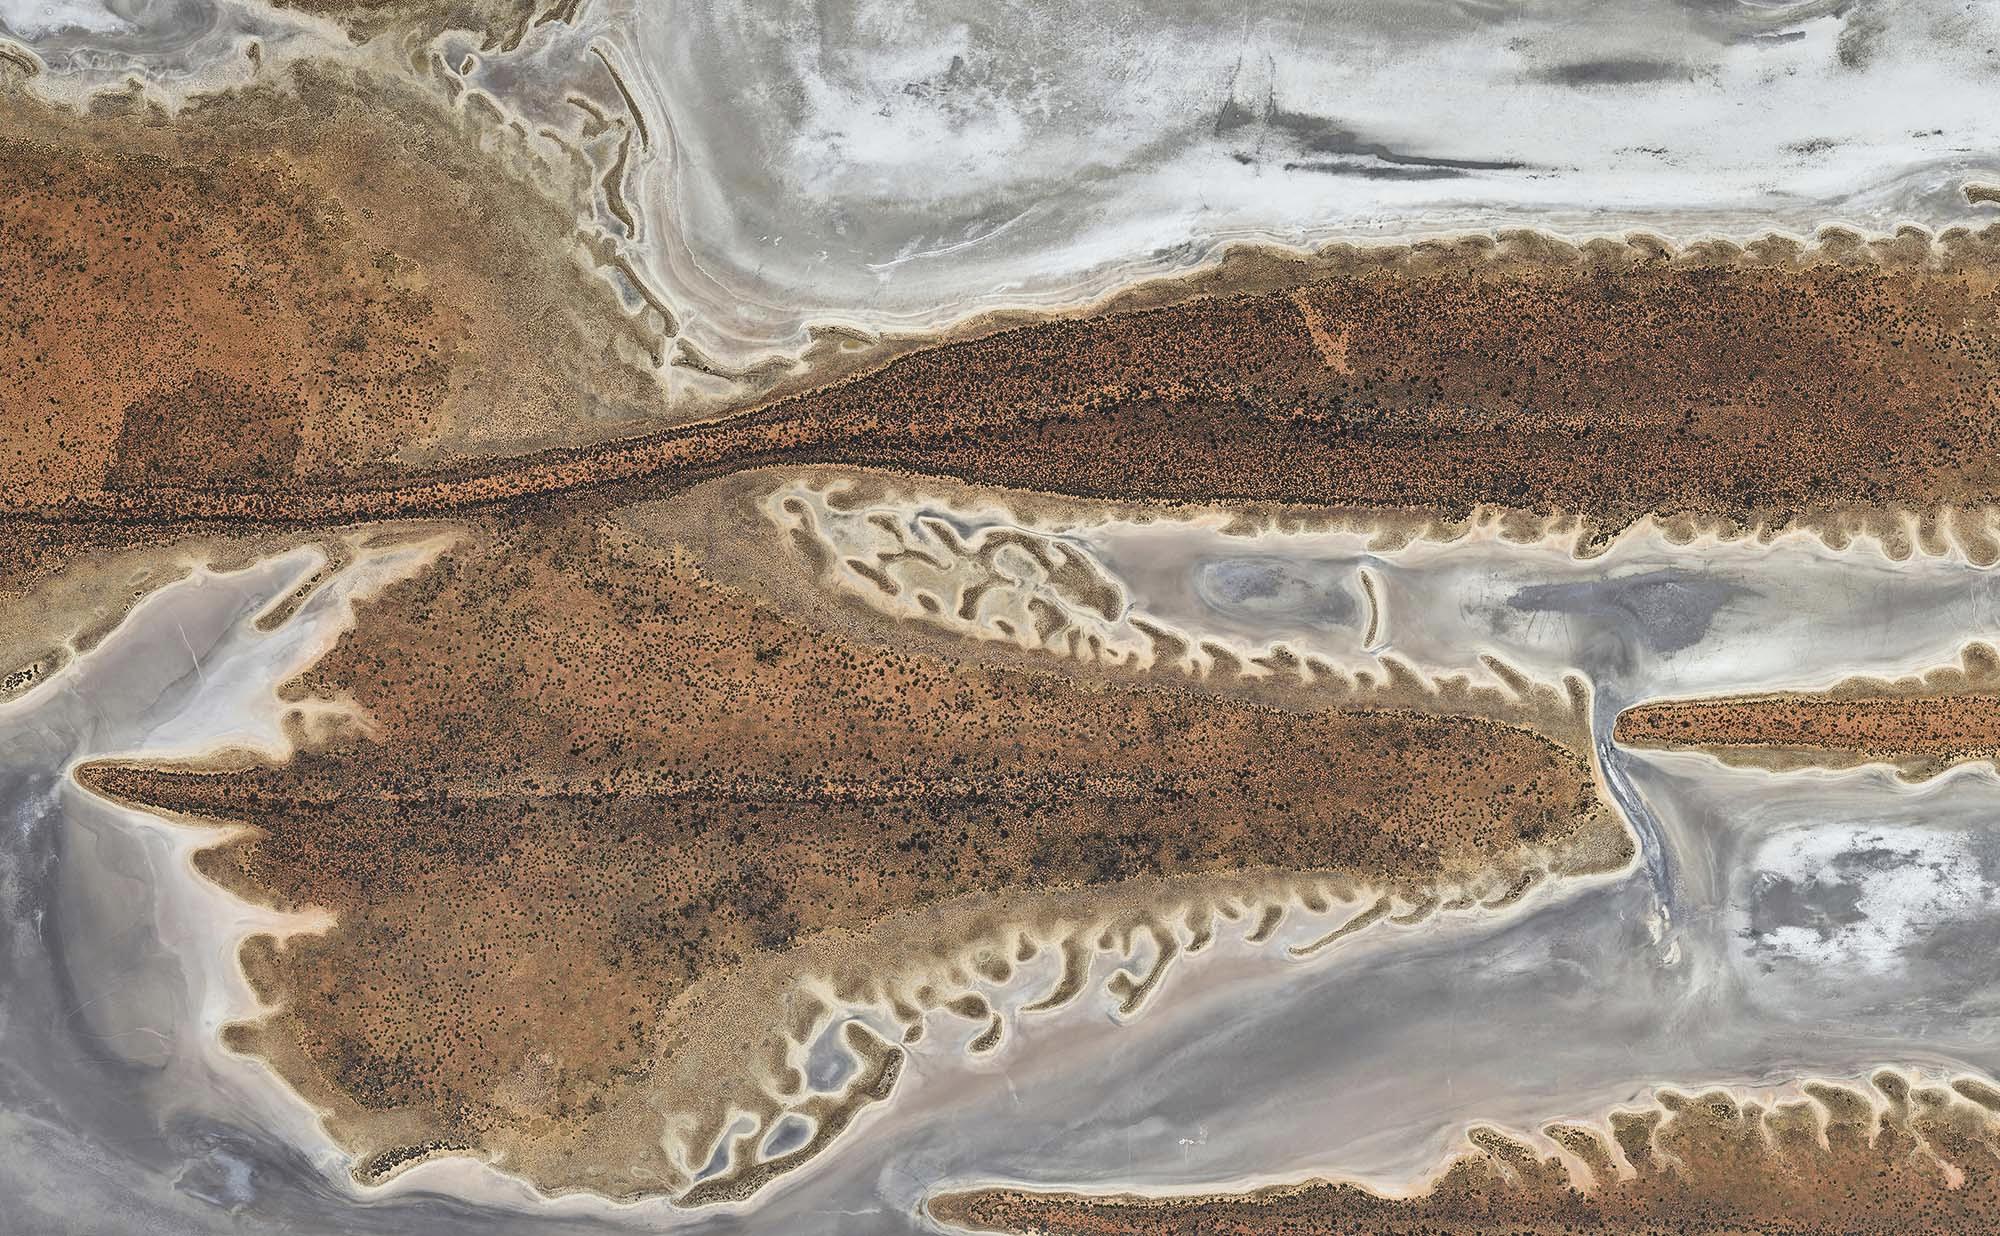 Crustaceons 2018